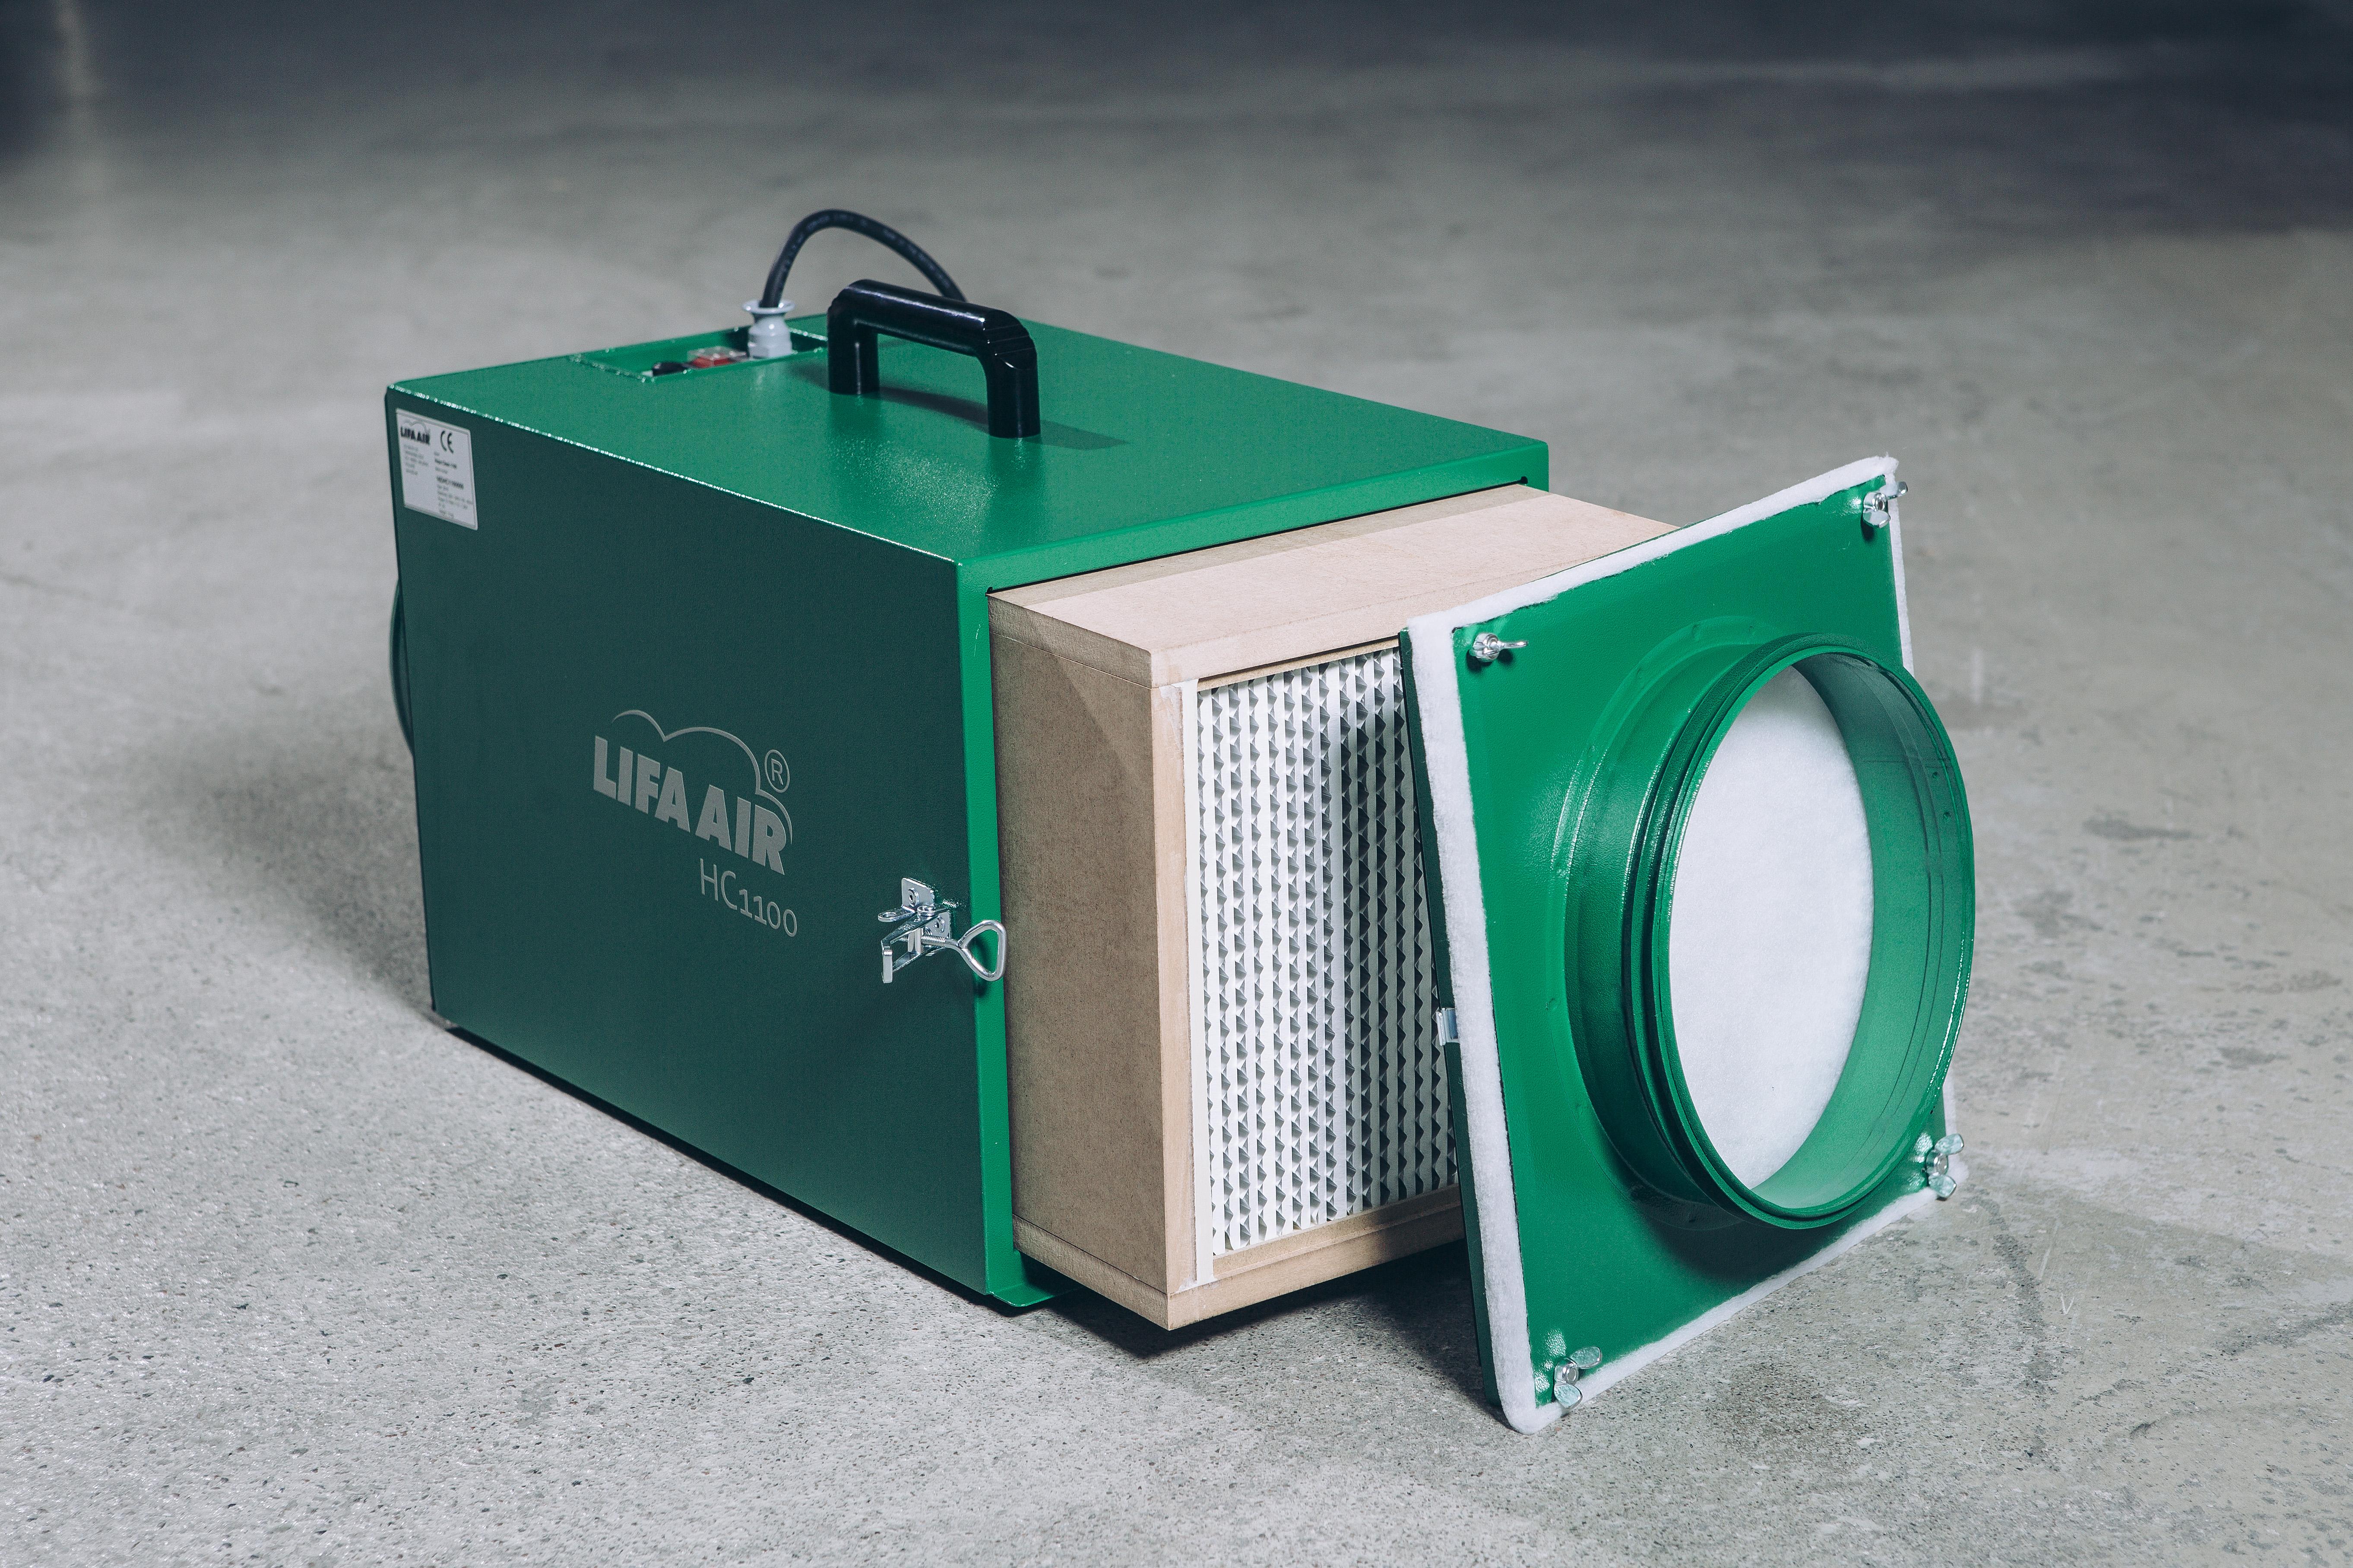 HC1100 lightweight negative air machine